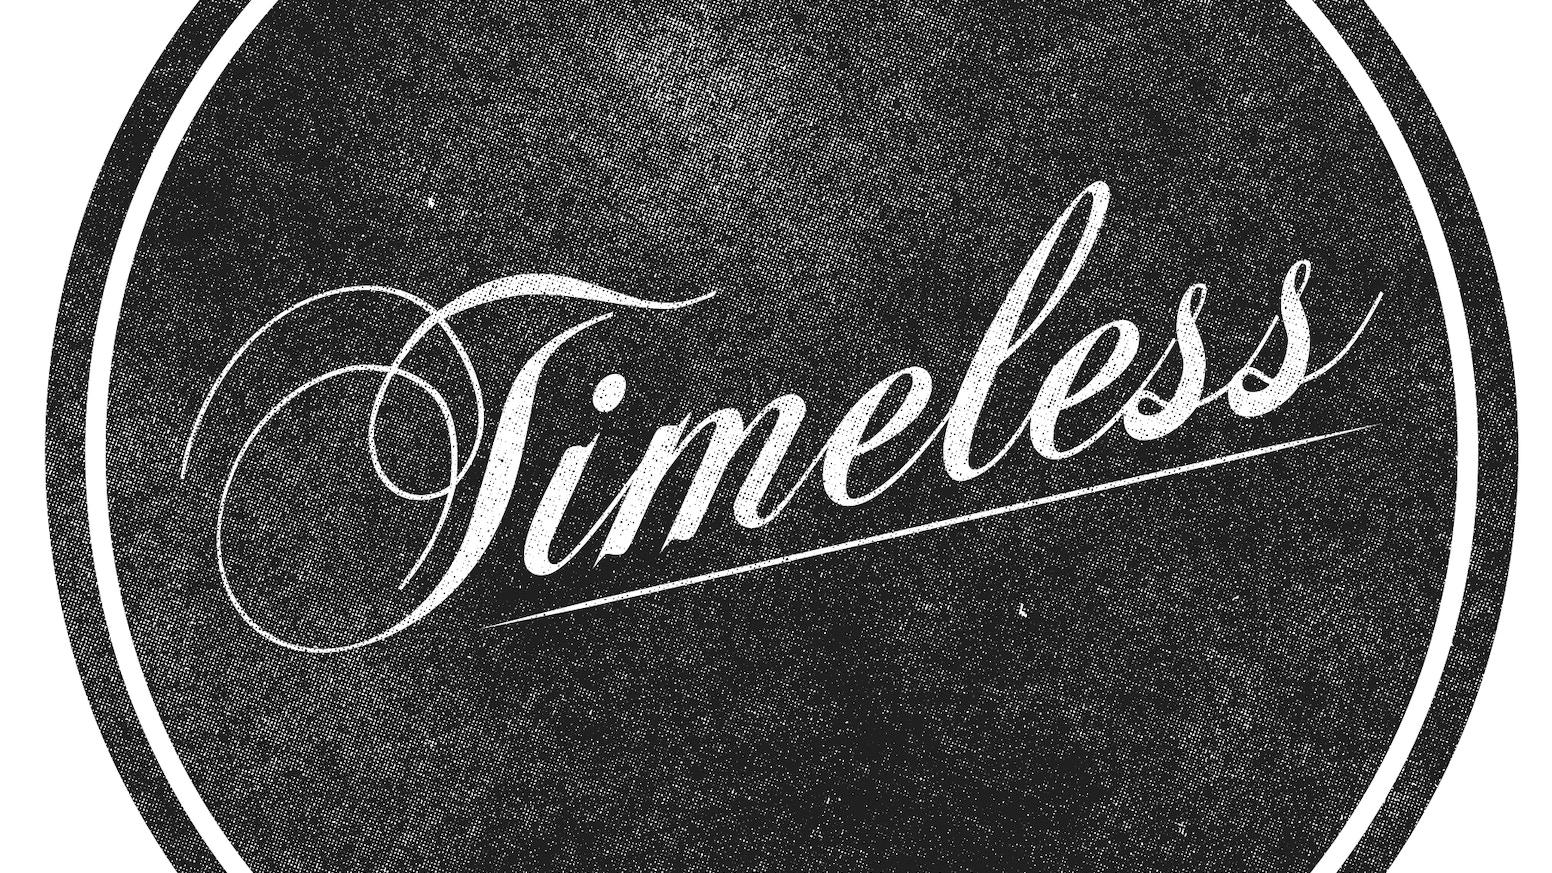 timeless coffee roasters by timeless coffee roasters kickstarter